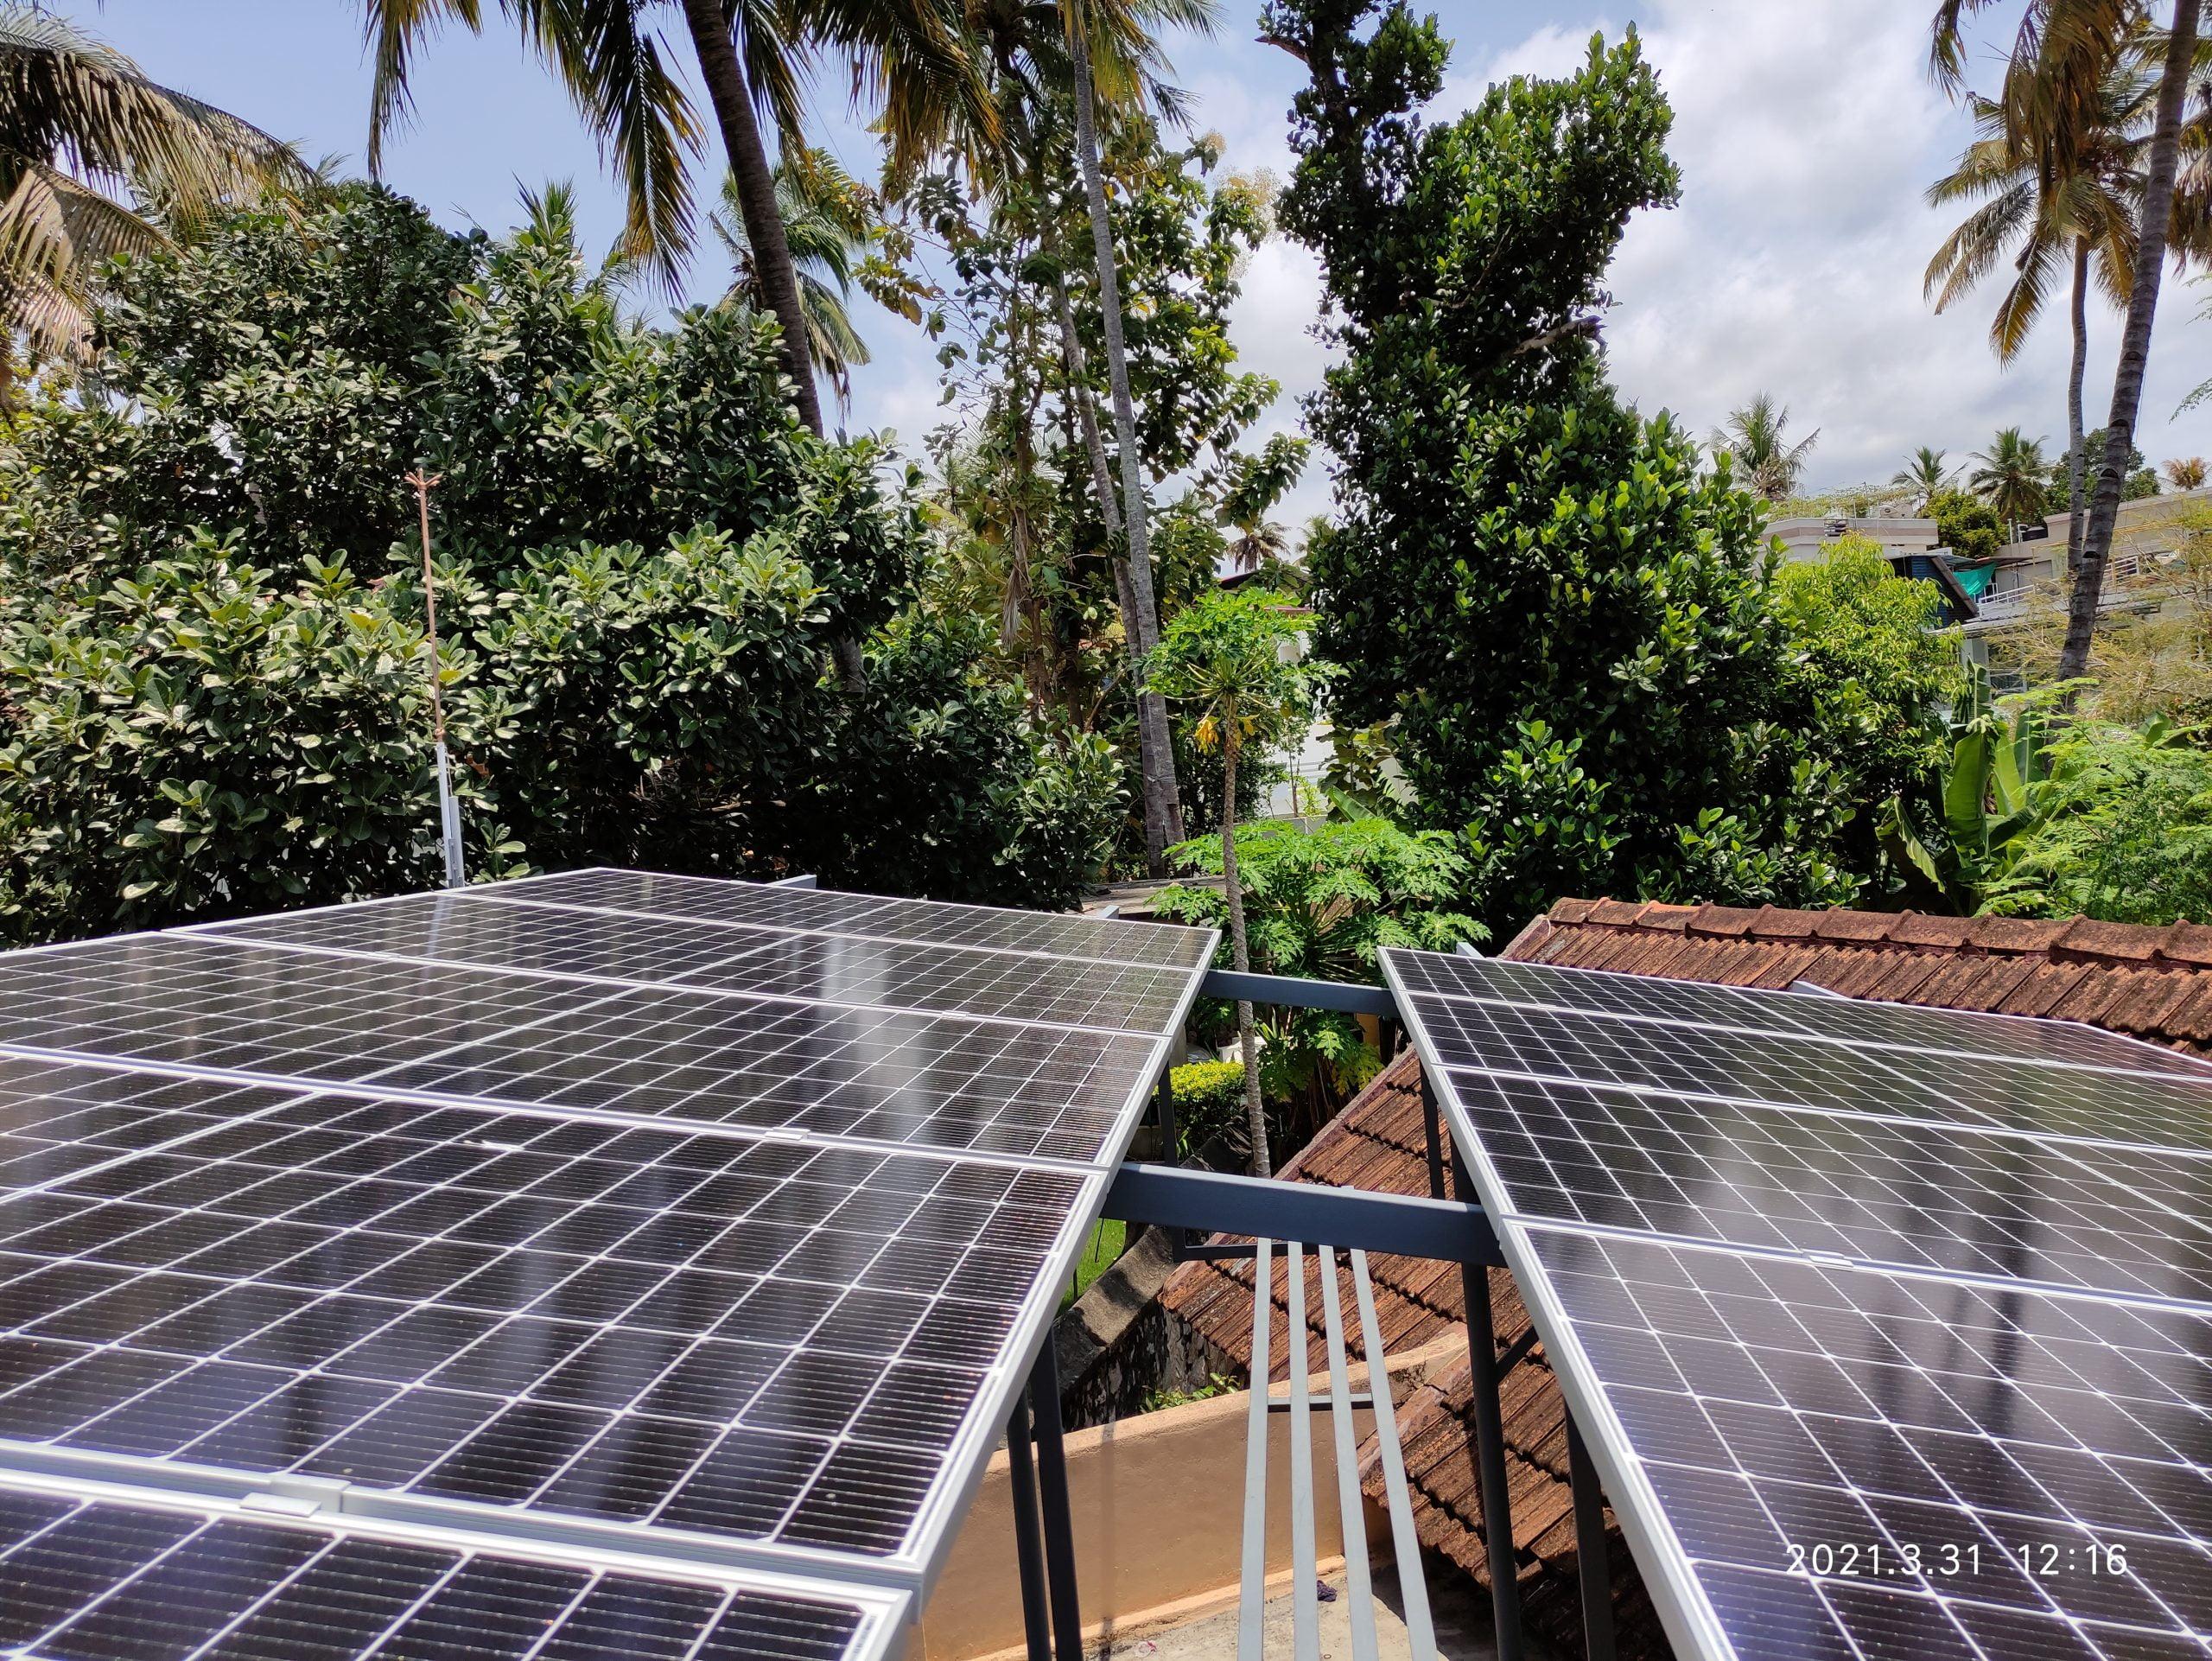 Solar Power Plant at Trivandrum 2